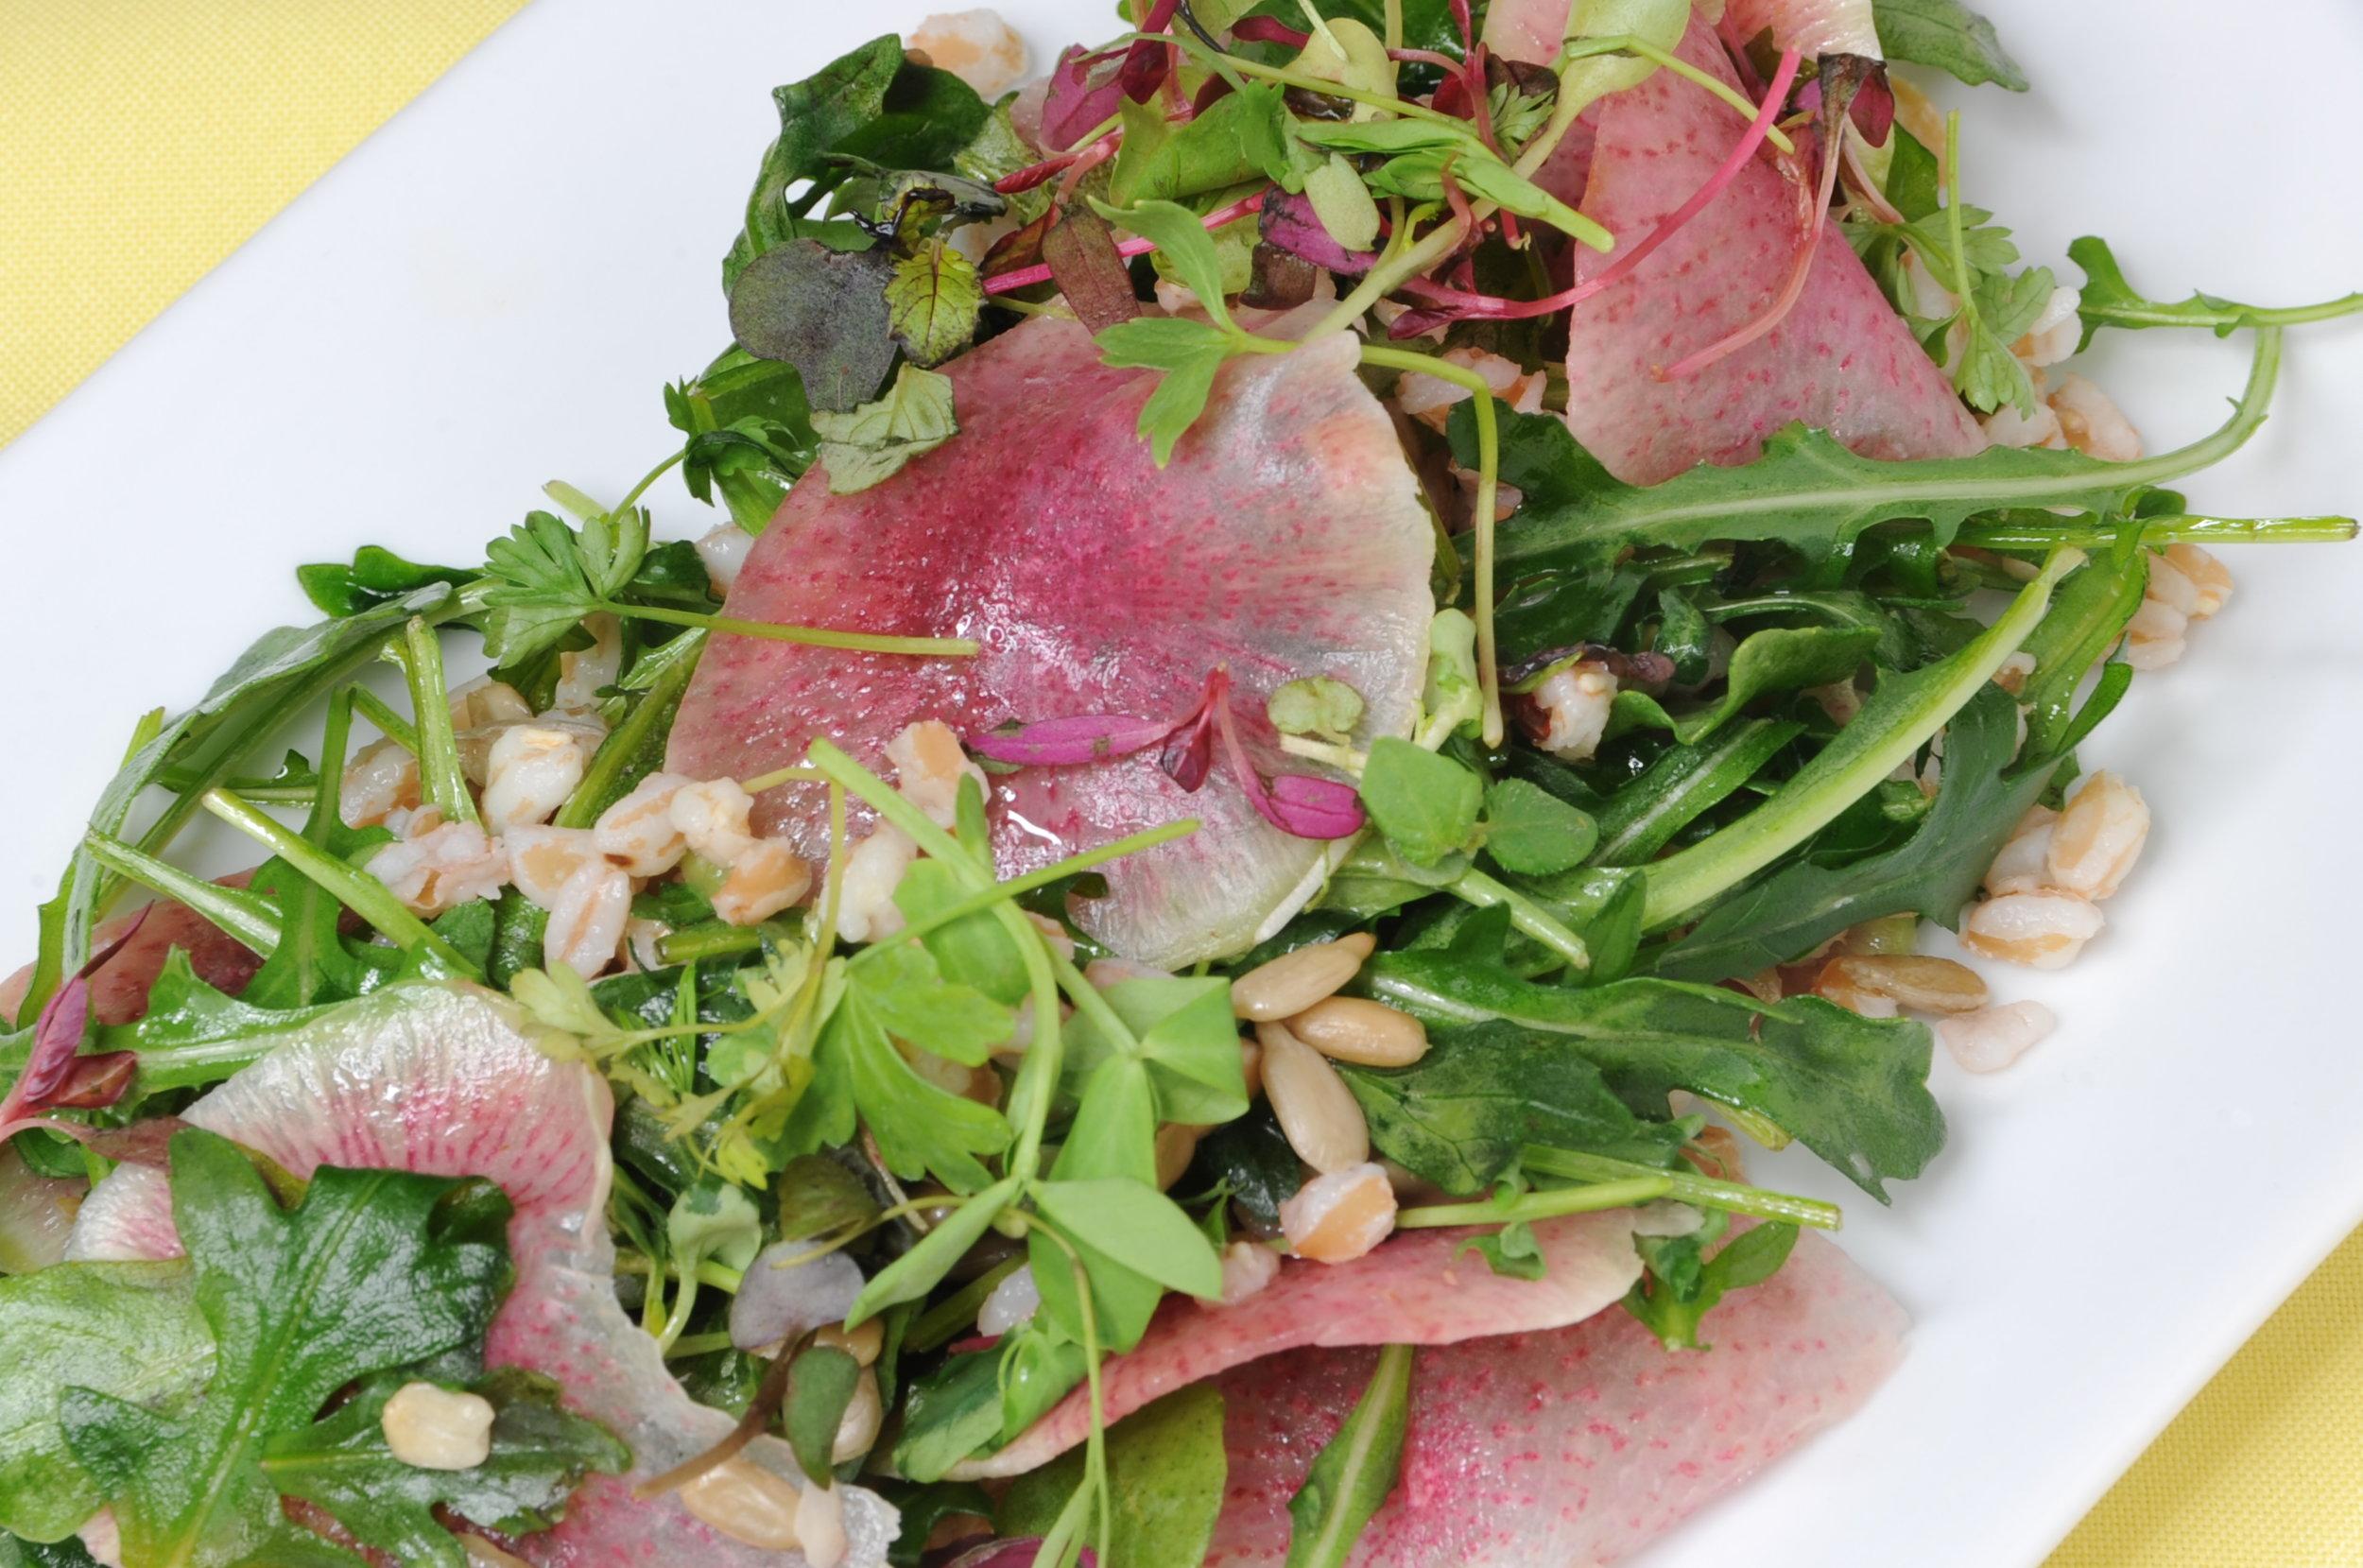 Watermelon Radish and Arugula Salad